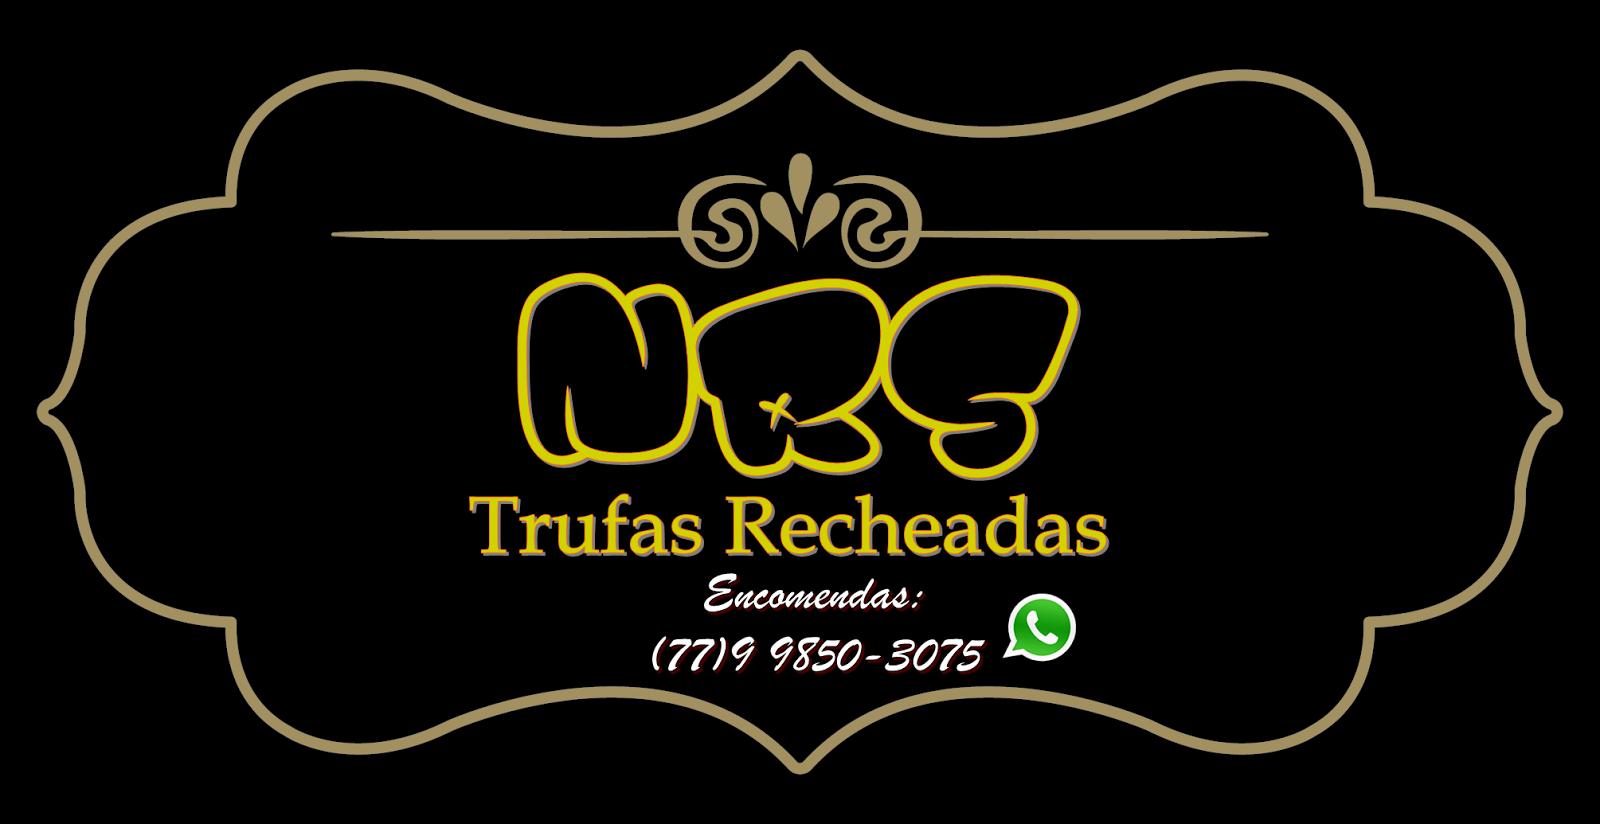 NRS Trufas Recheadas